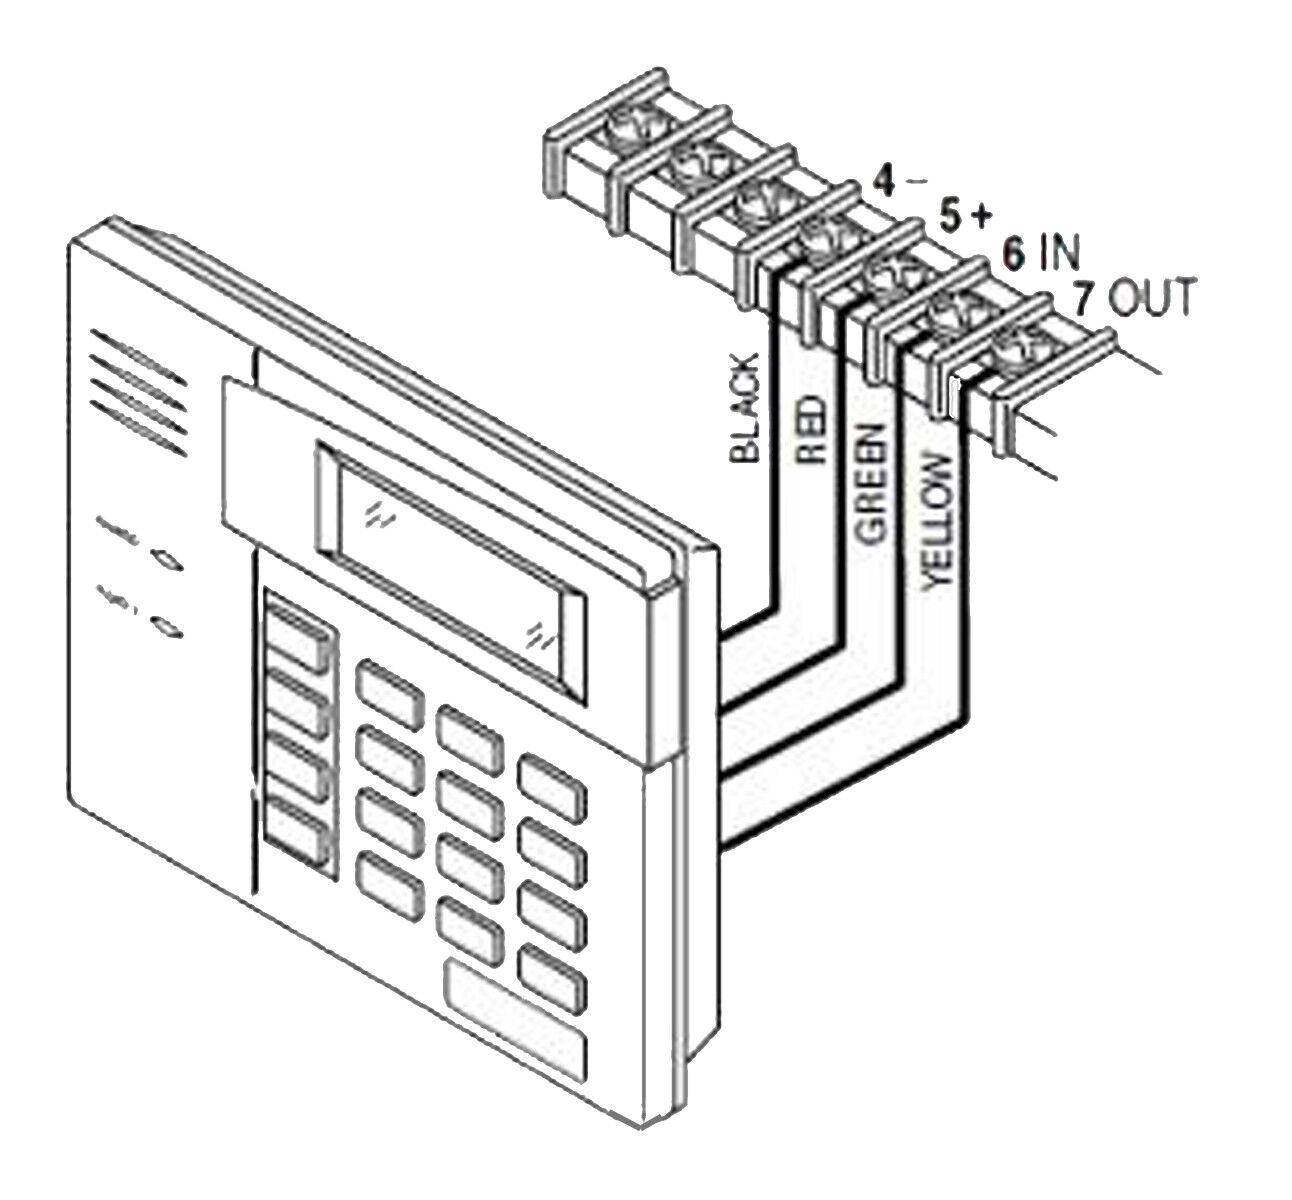 honeywell security 6160 ademco alpha display keypad ebay ADT Alarm Logo